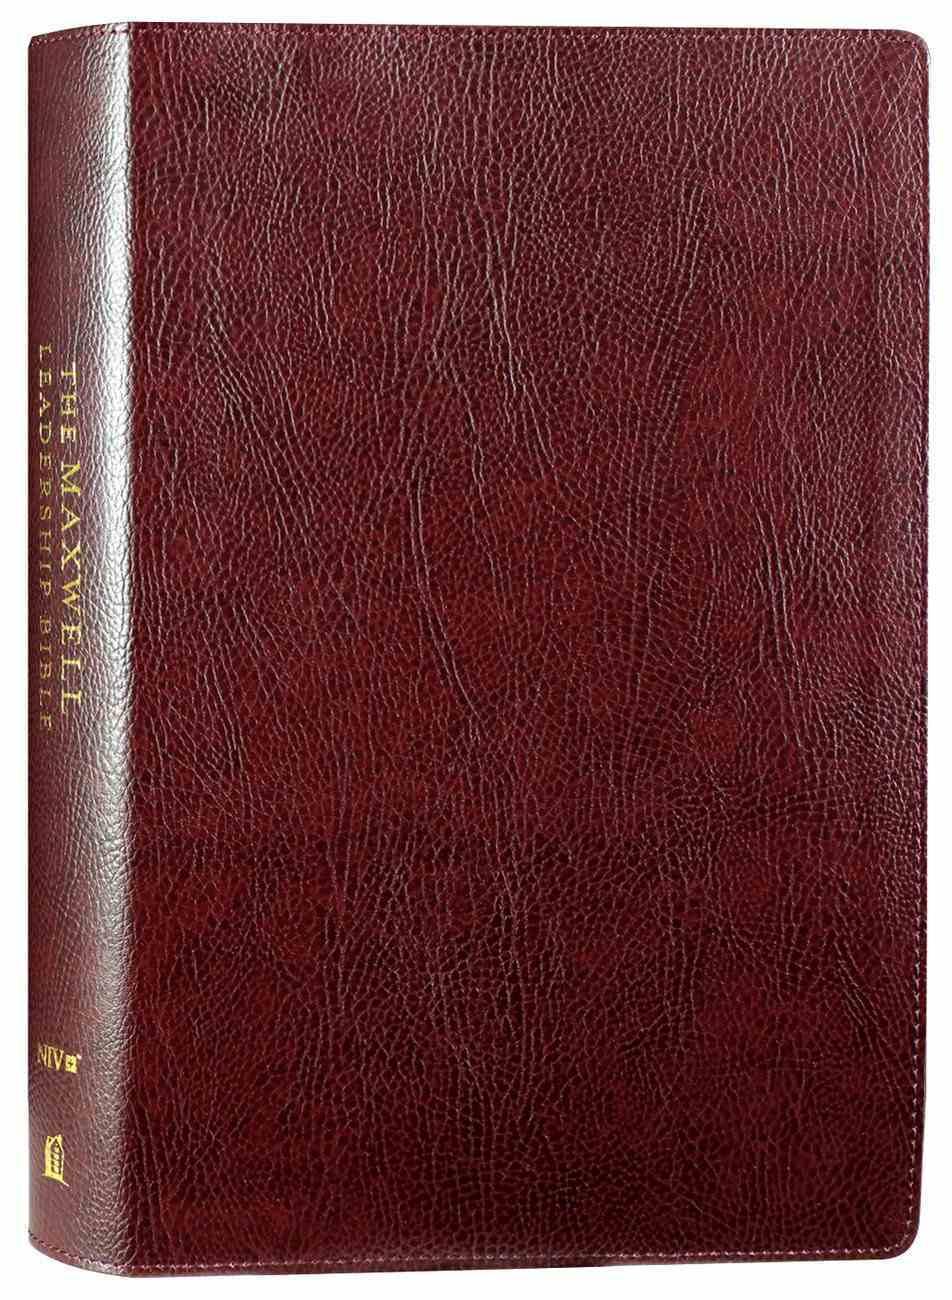 NIV Maxwell Leadership Bible Burgundy 3rd Edition Bonded Leather